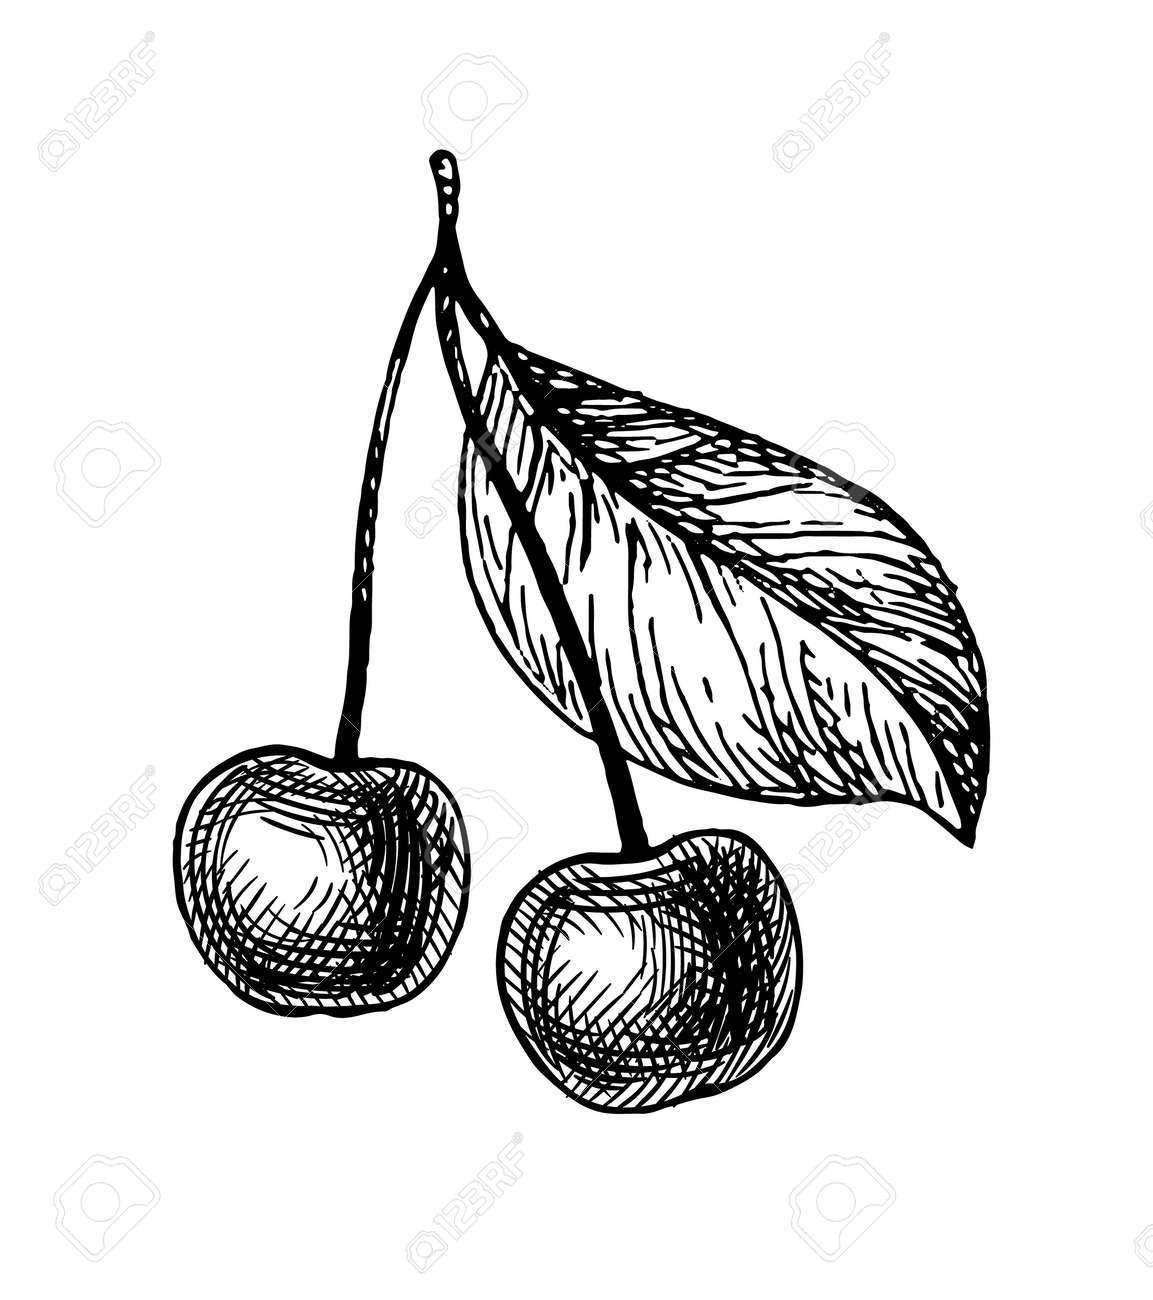 Cherry ink sketch. - 171667128